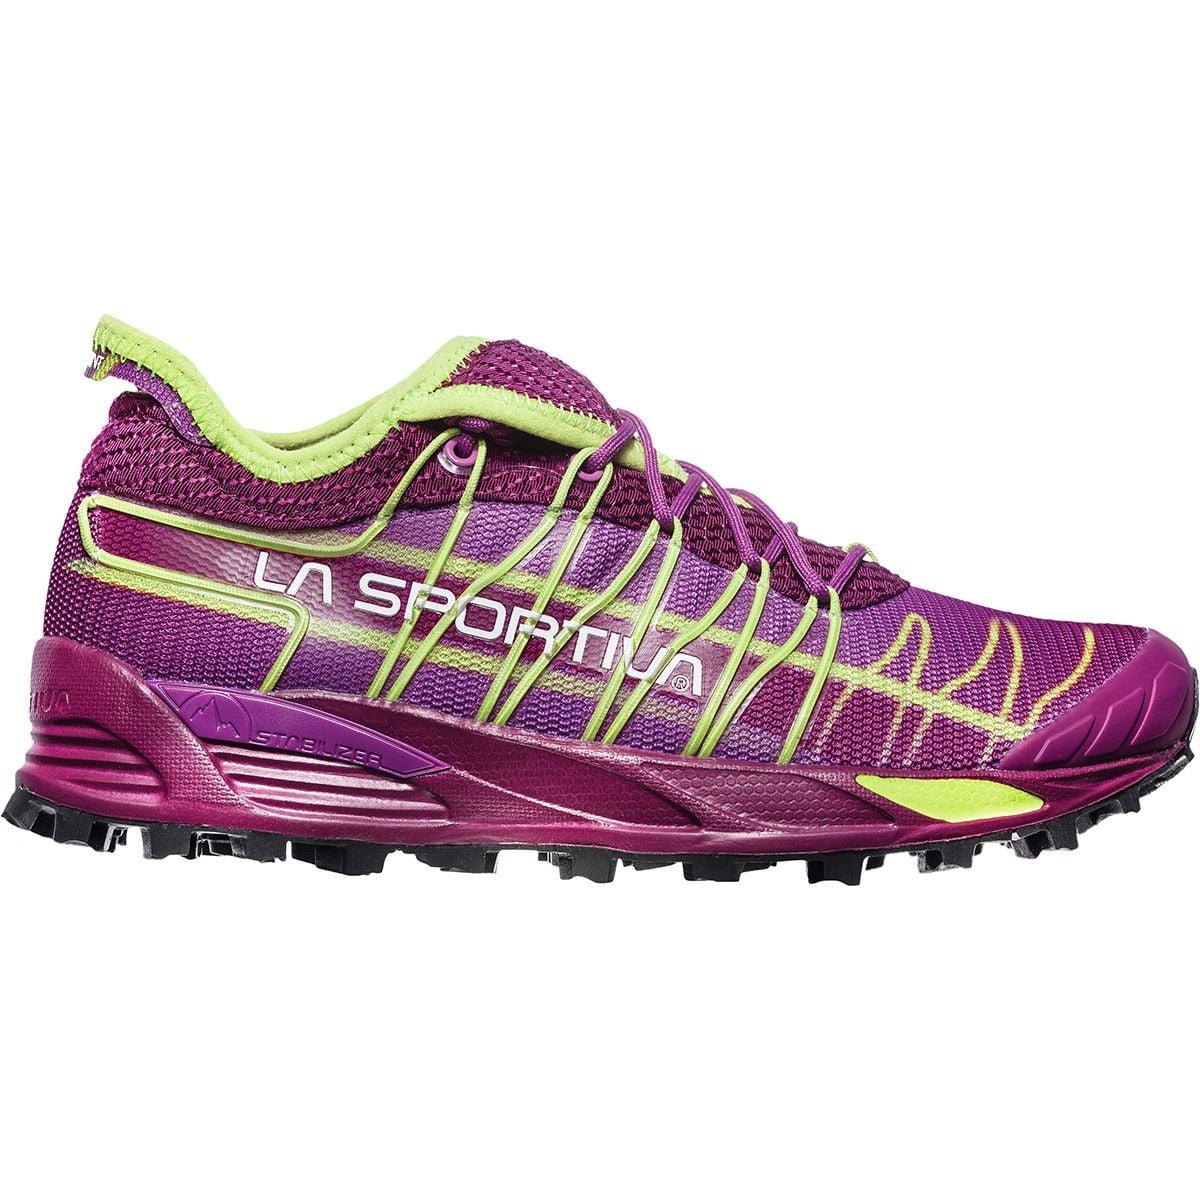 La Shoe Sportiva Mutant Trail Running Shoe La - Women's c3934e